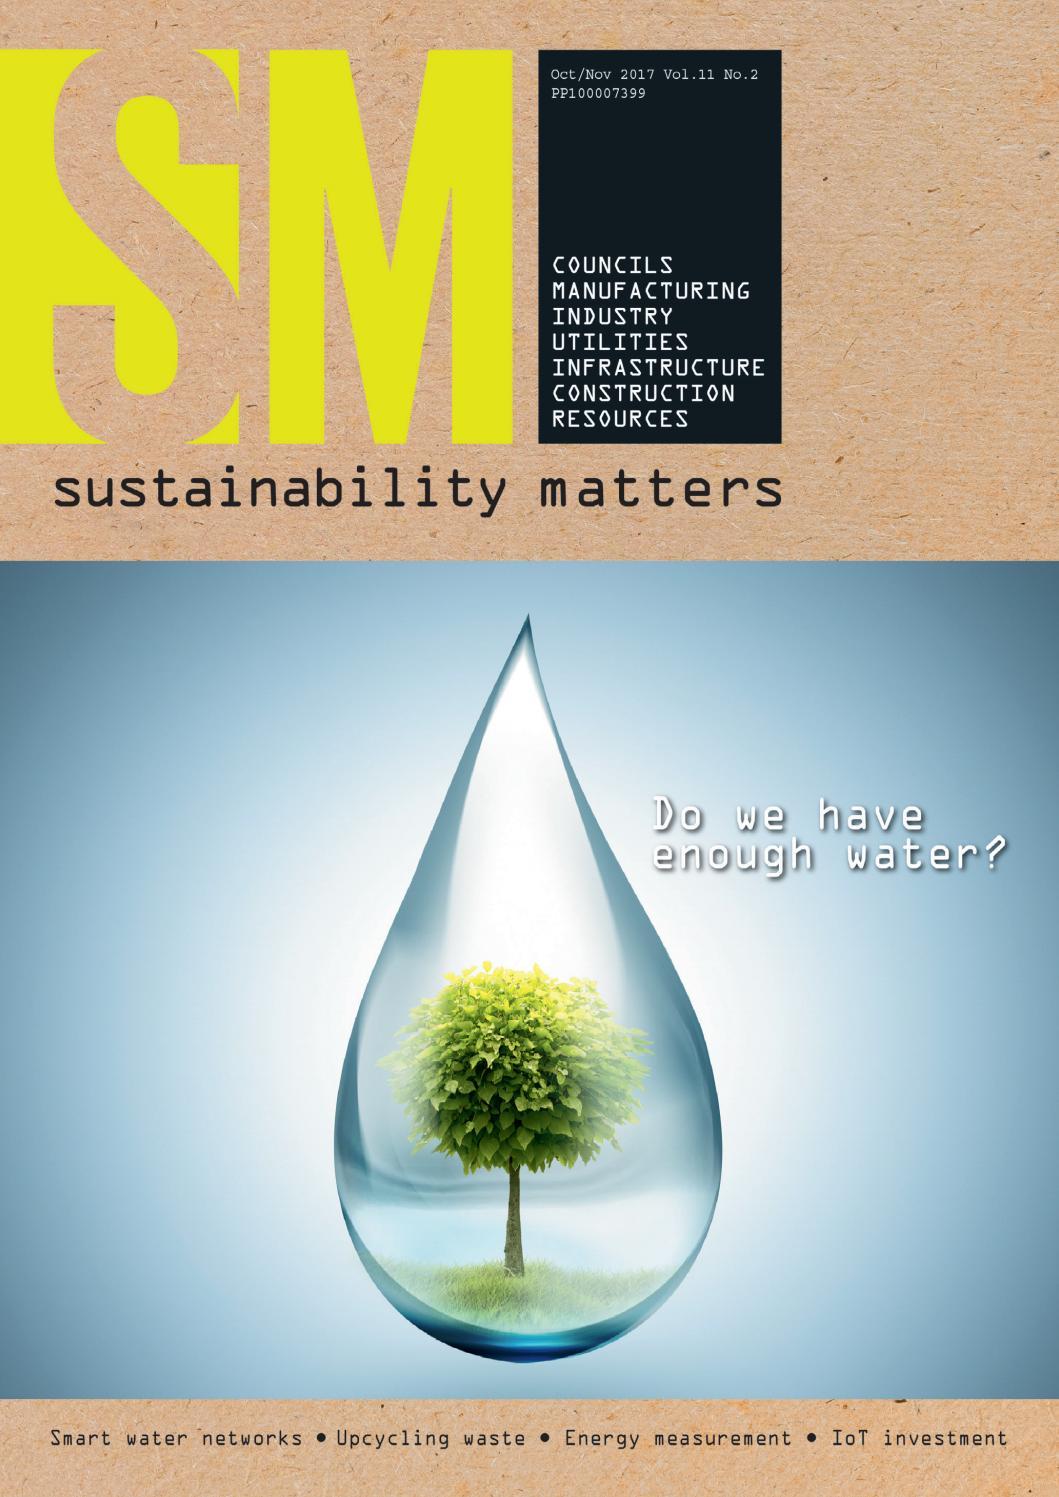 Sustainability Matters Oct/Nov 2017 by Westwick-Farrow Media - issuu